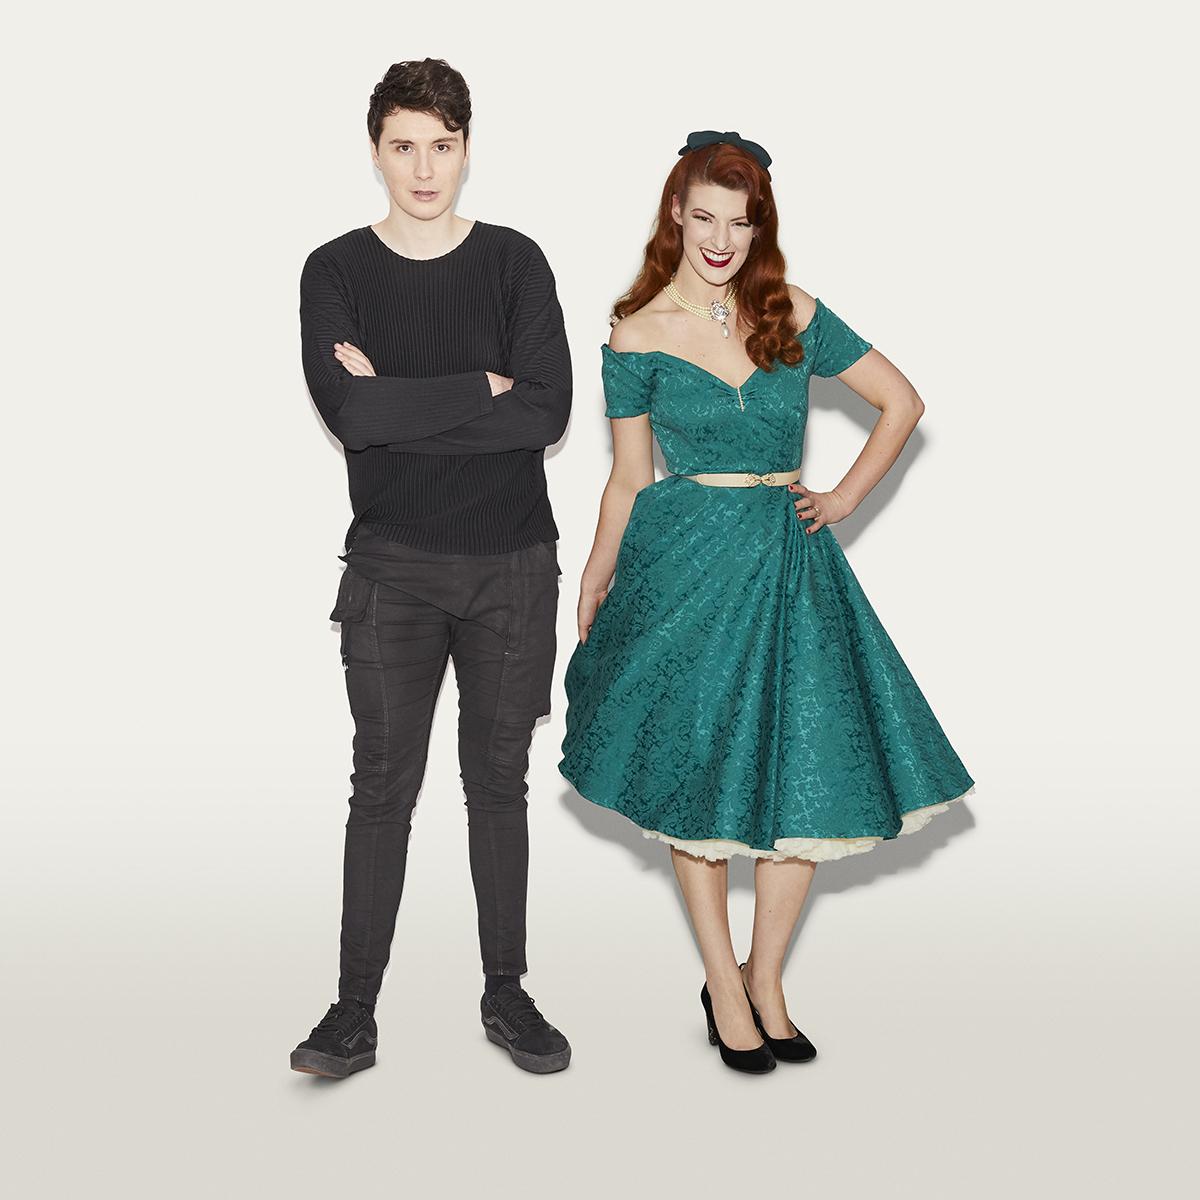 Daniel Howell and Jessica Kellgren-Fozard of Jessica Out of the Closet (credit: Henry J Kamara)